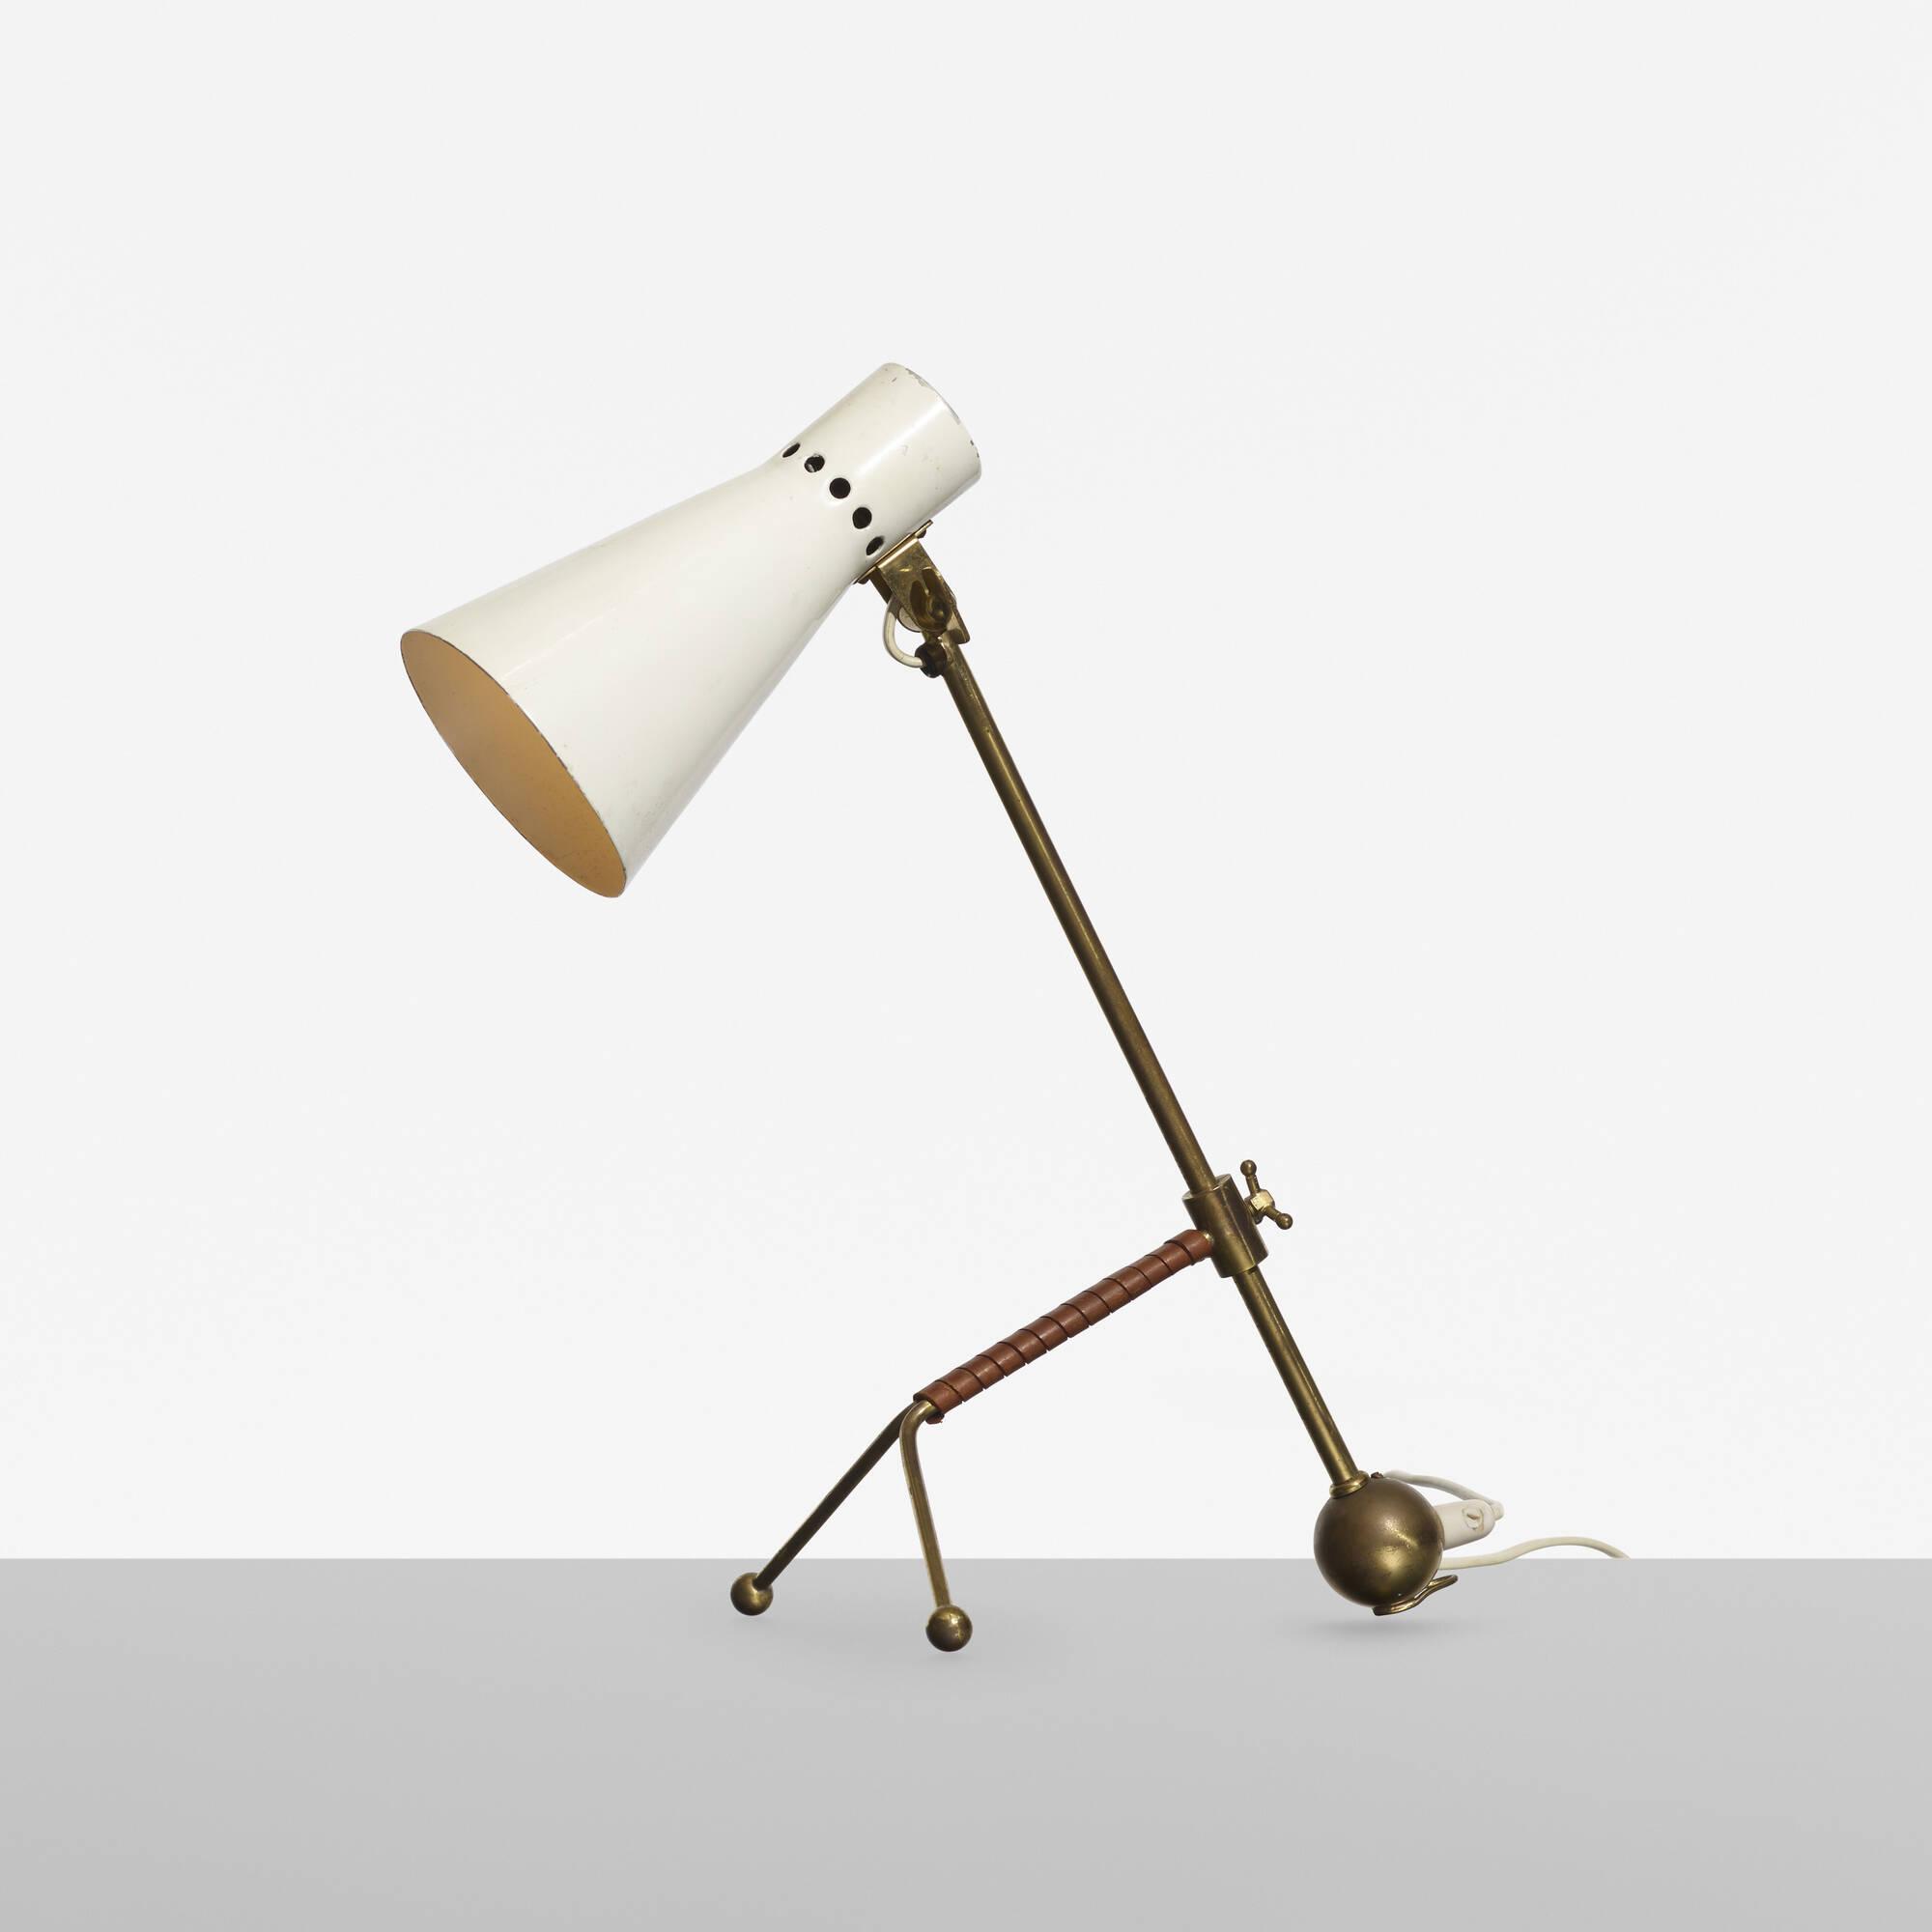 120: Tapio Wirkkala / table lamp, model K11-16 (1 of 2)